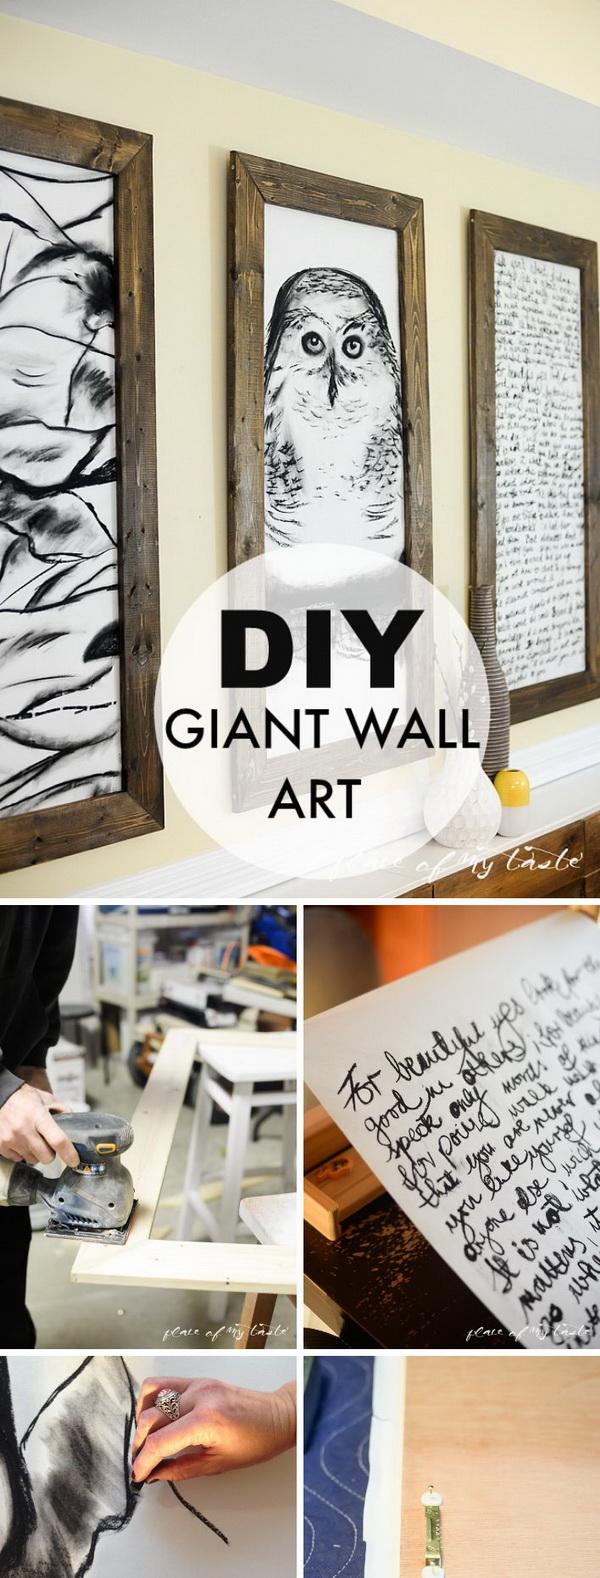 DIY Rustic Giant Wall Art.